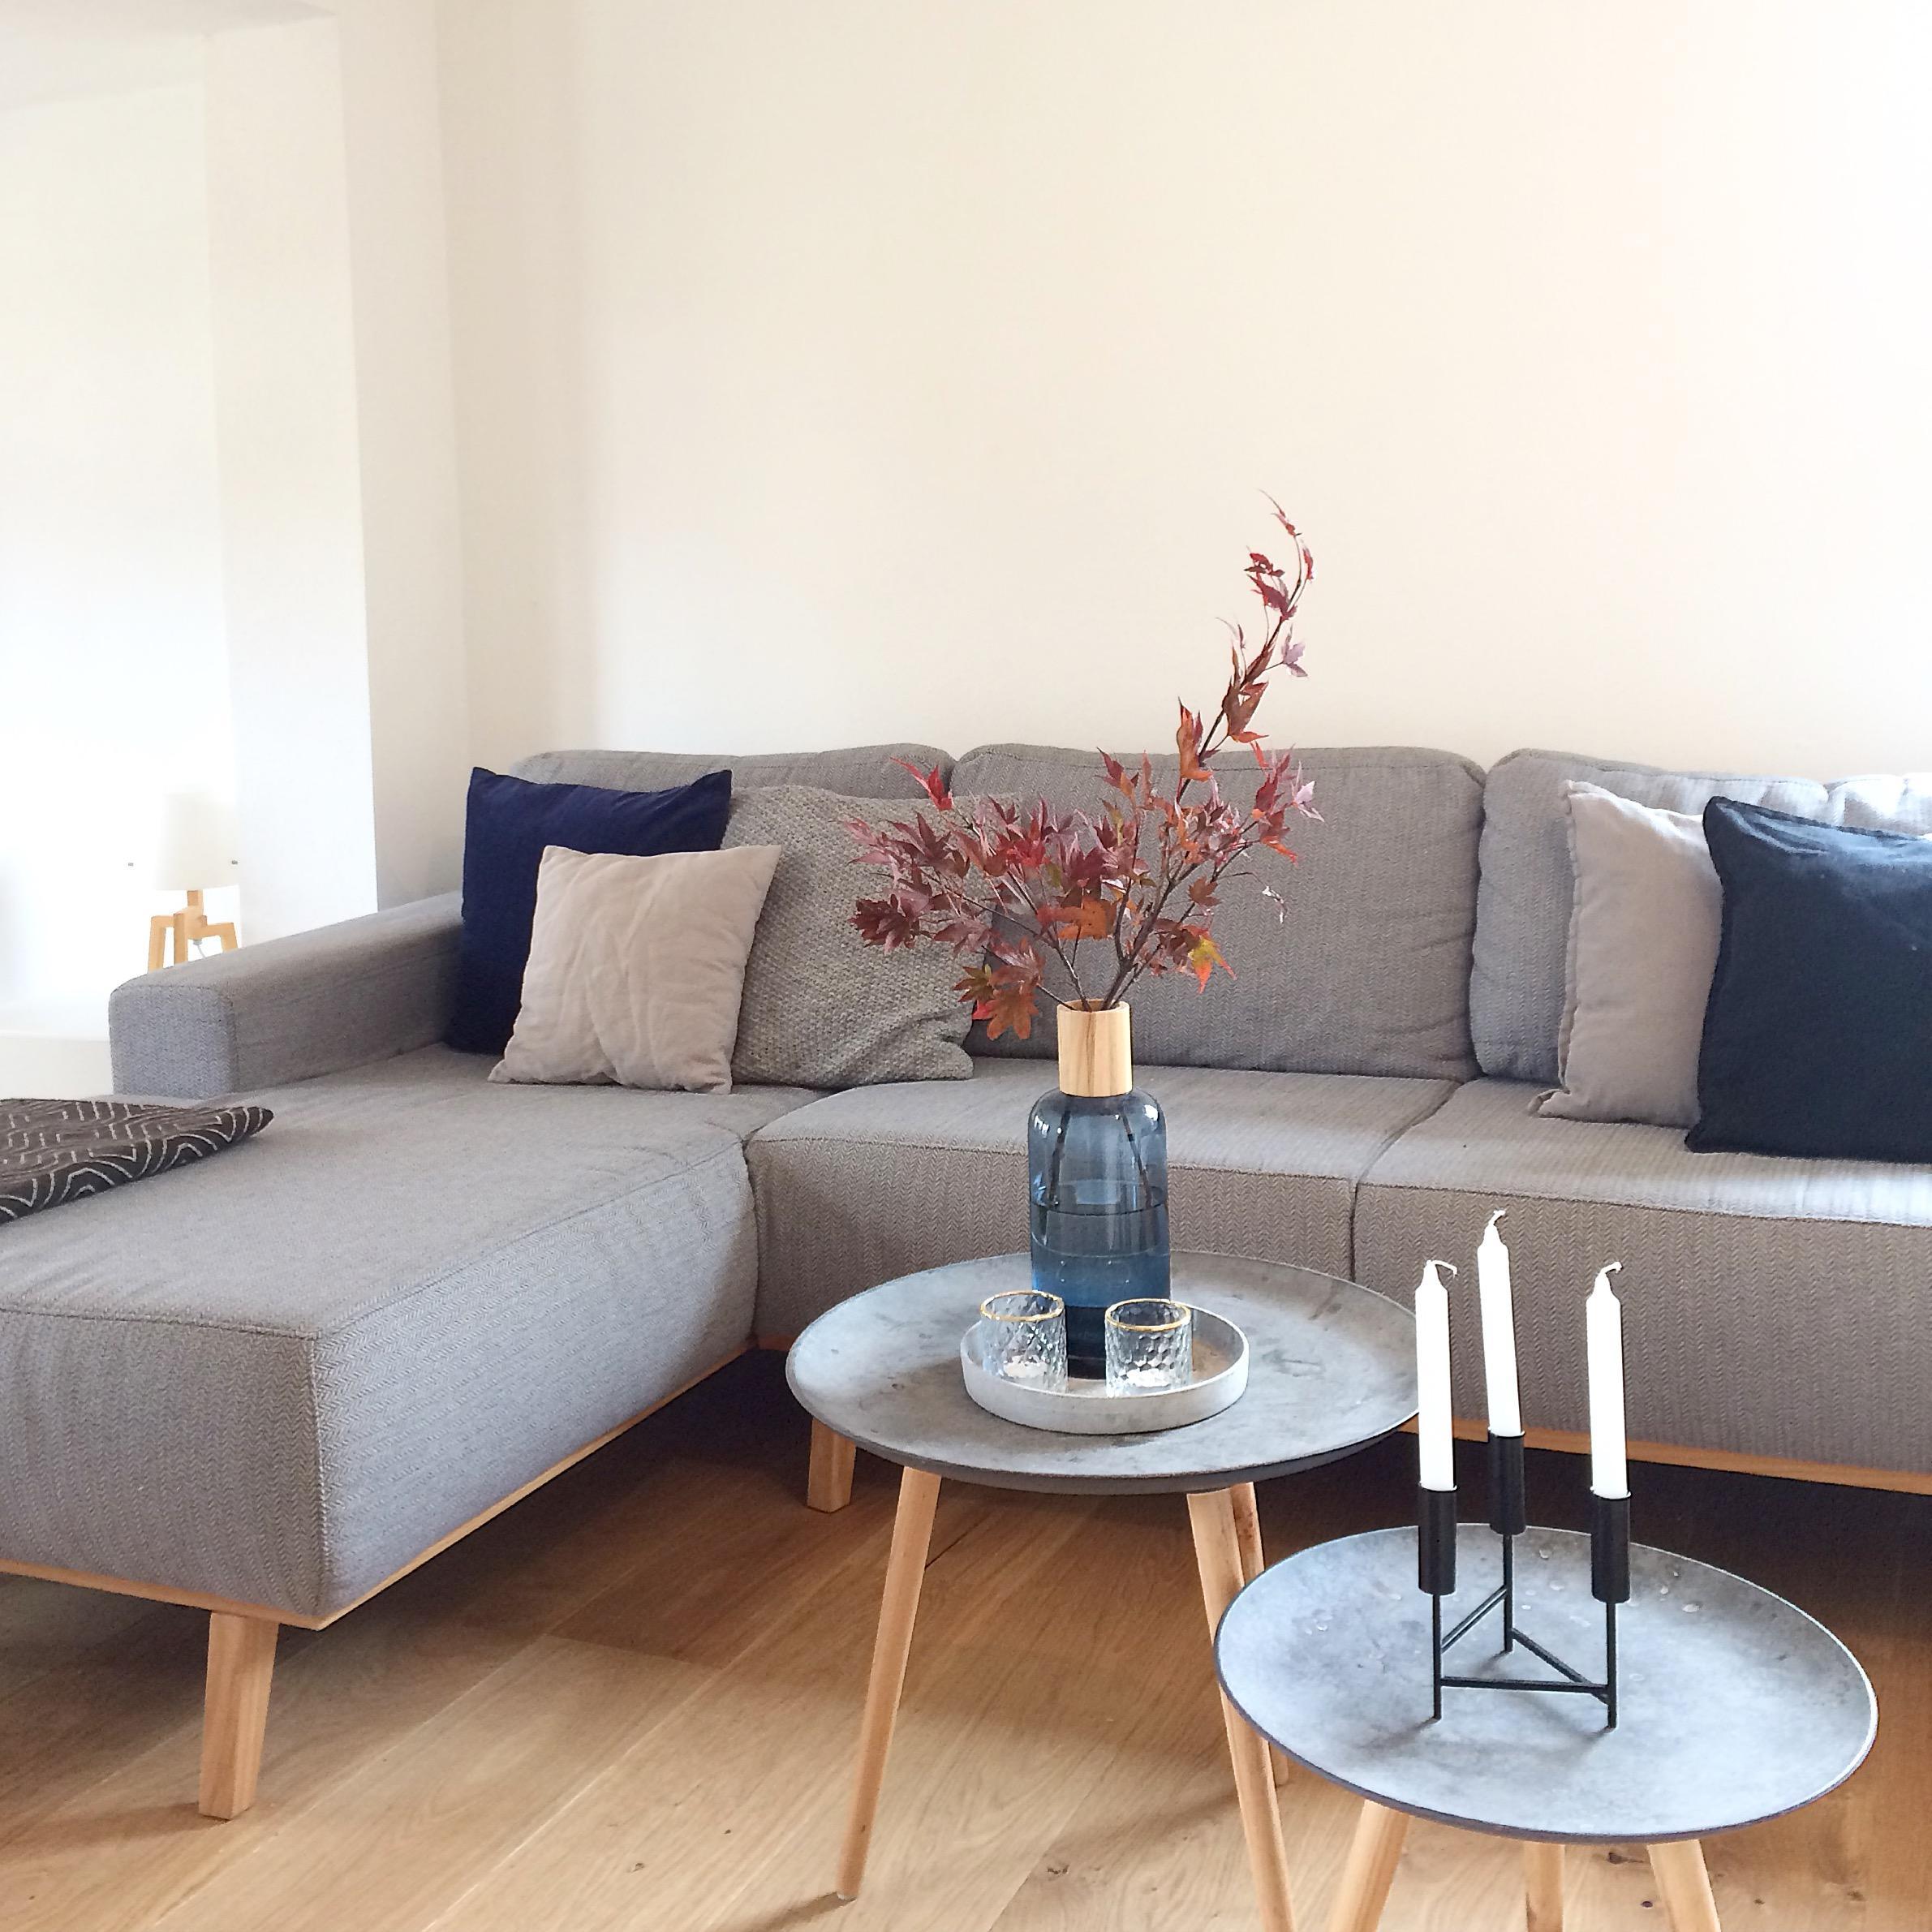 kissen bilder ideen couchstyle. Black Bedroom Furniture Sets. Home Design Ideas